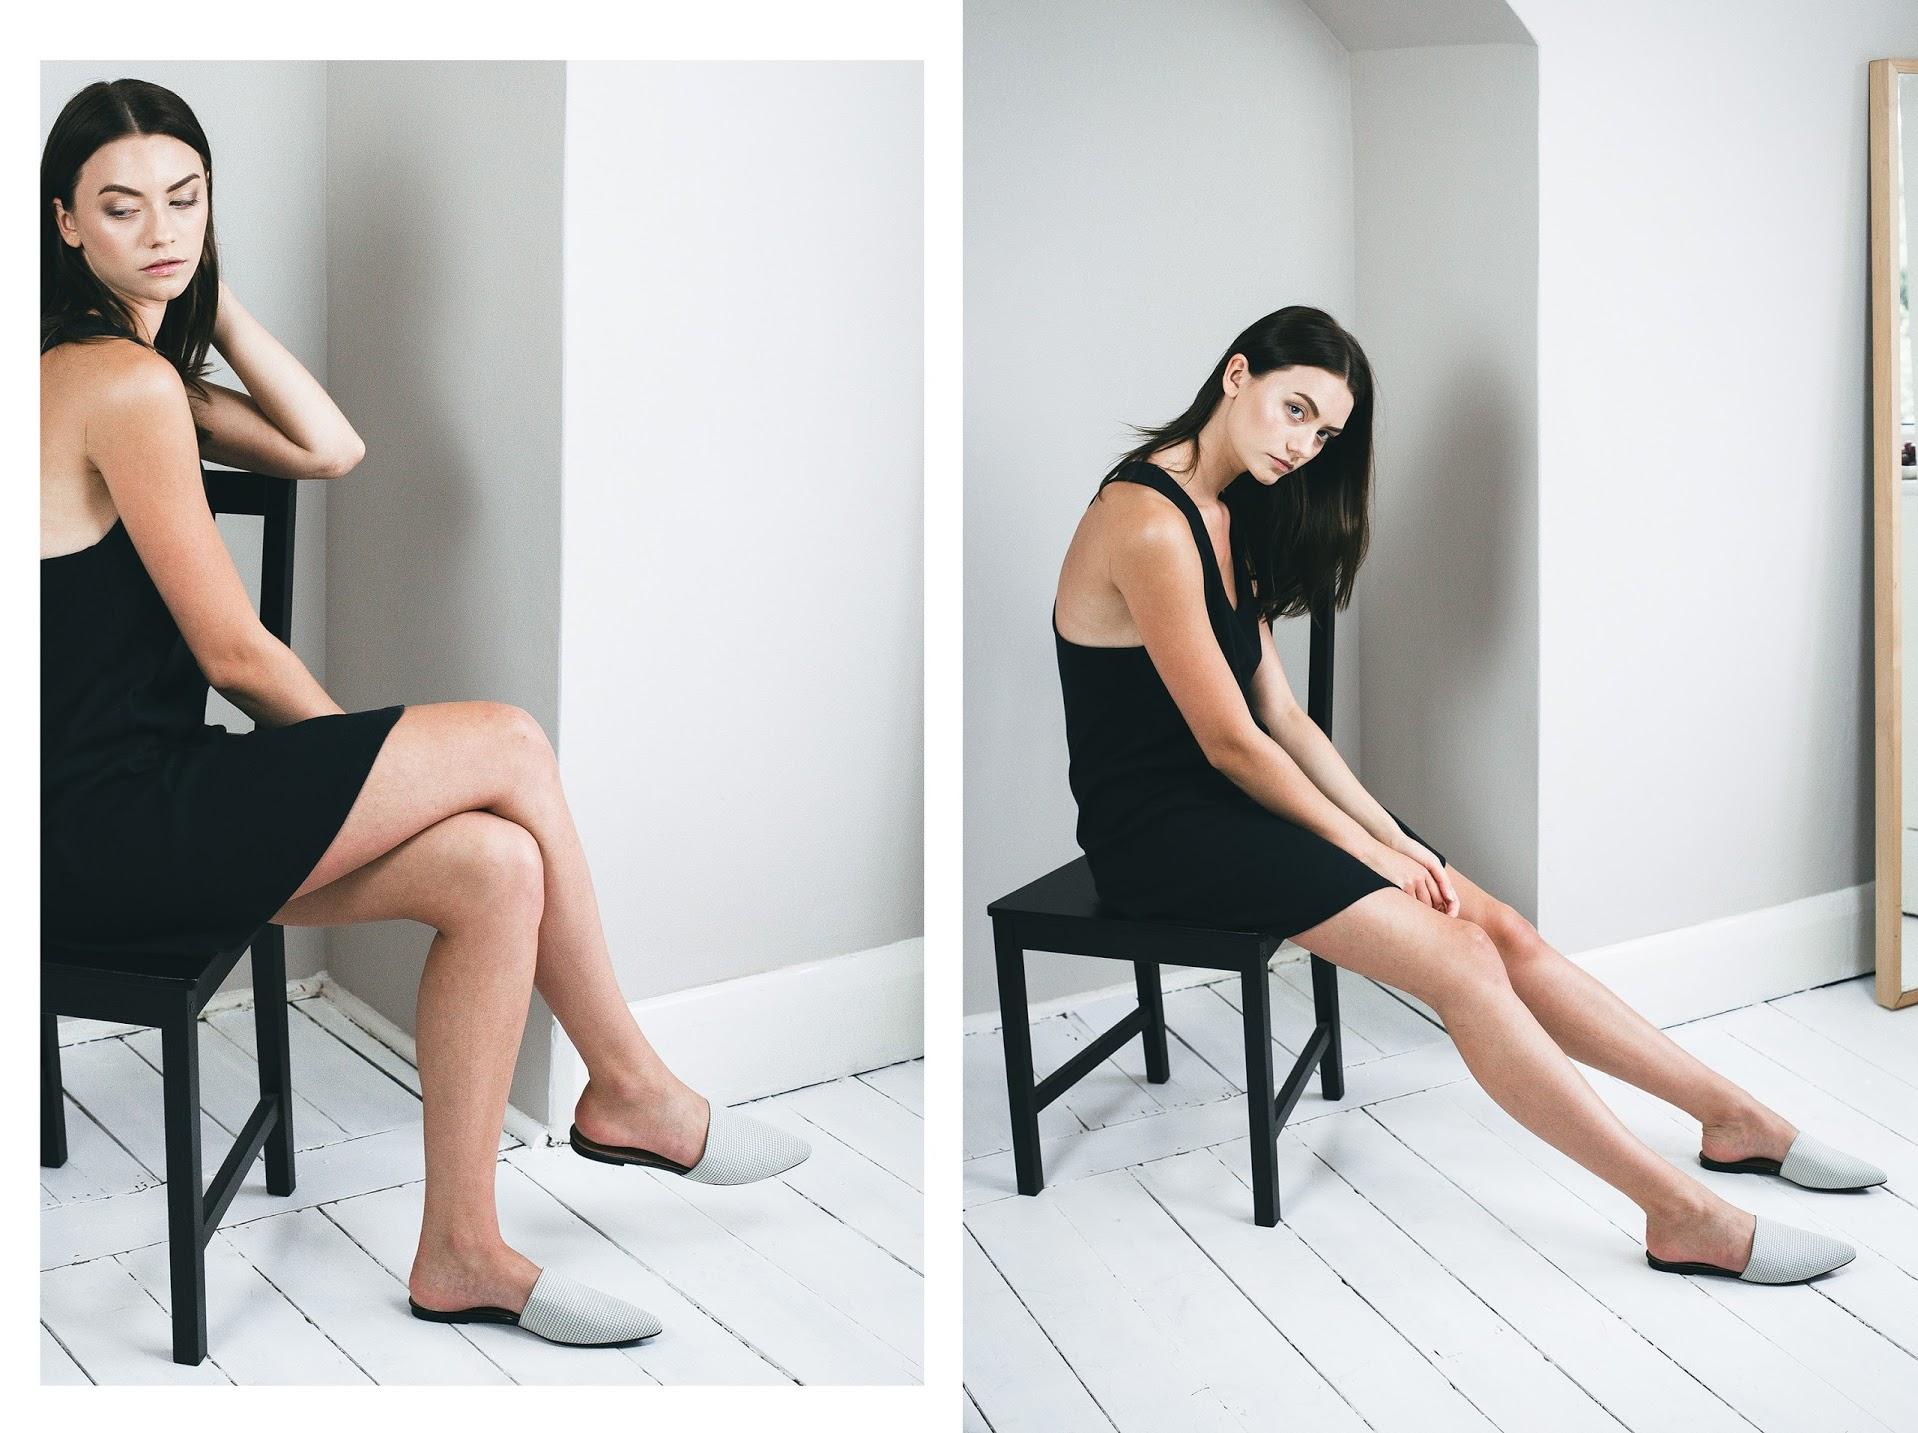 The Zoldfold Editorial Sussex Portrait Photographer VILCINSKAITE PHOTO 5.jpg